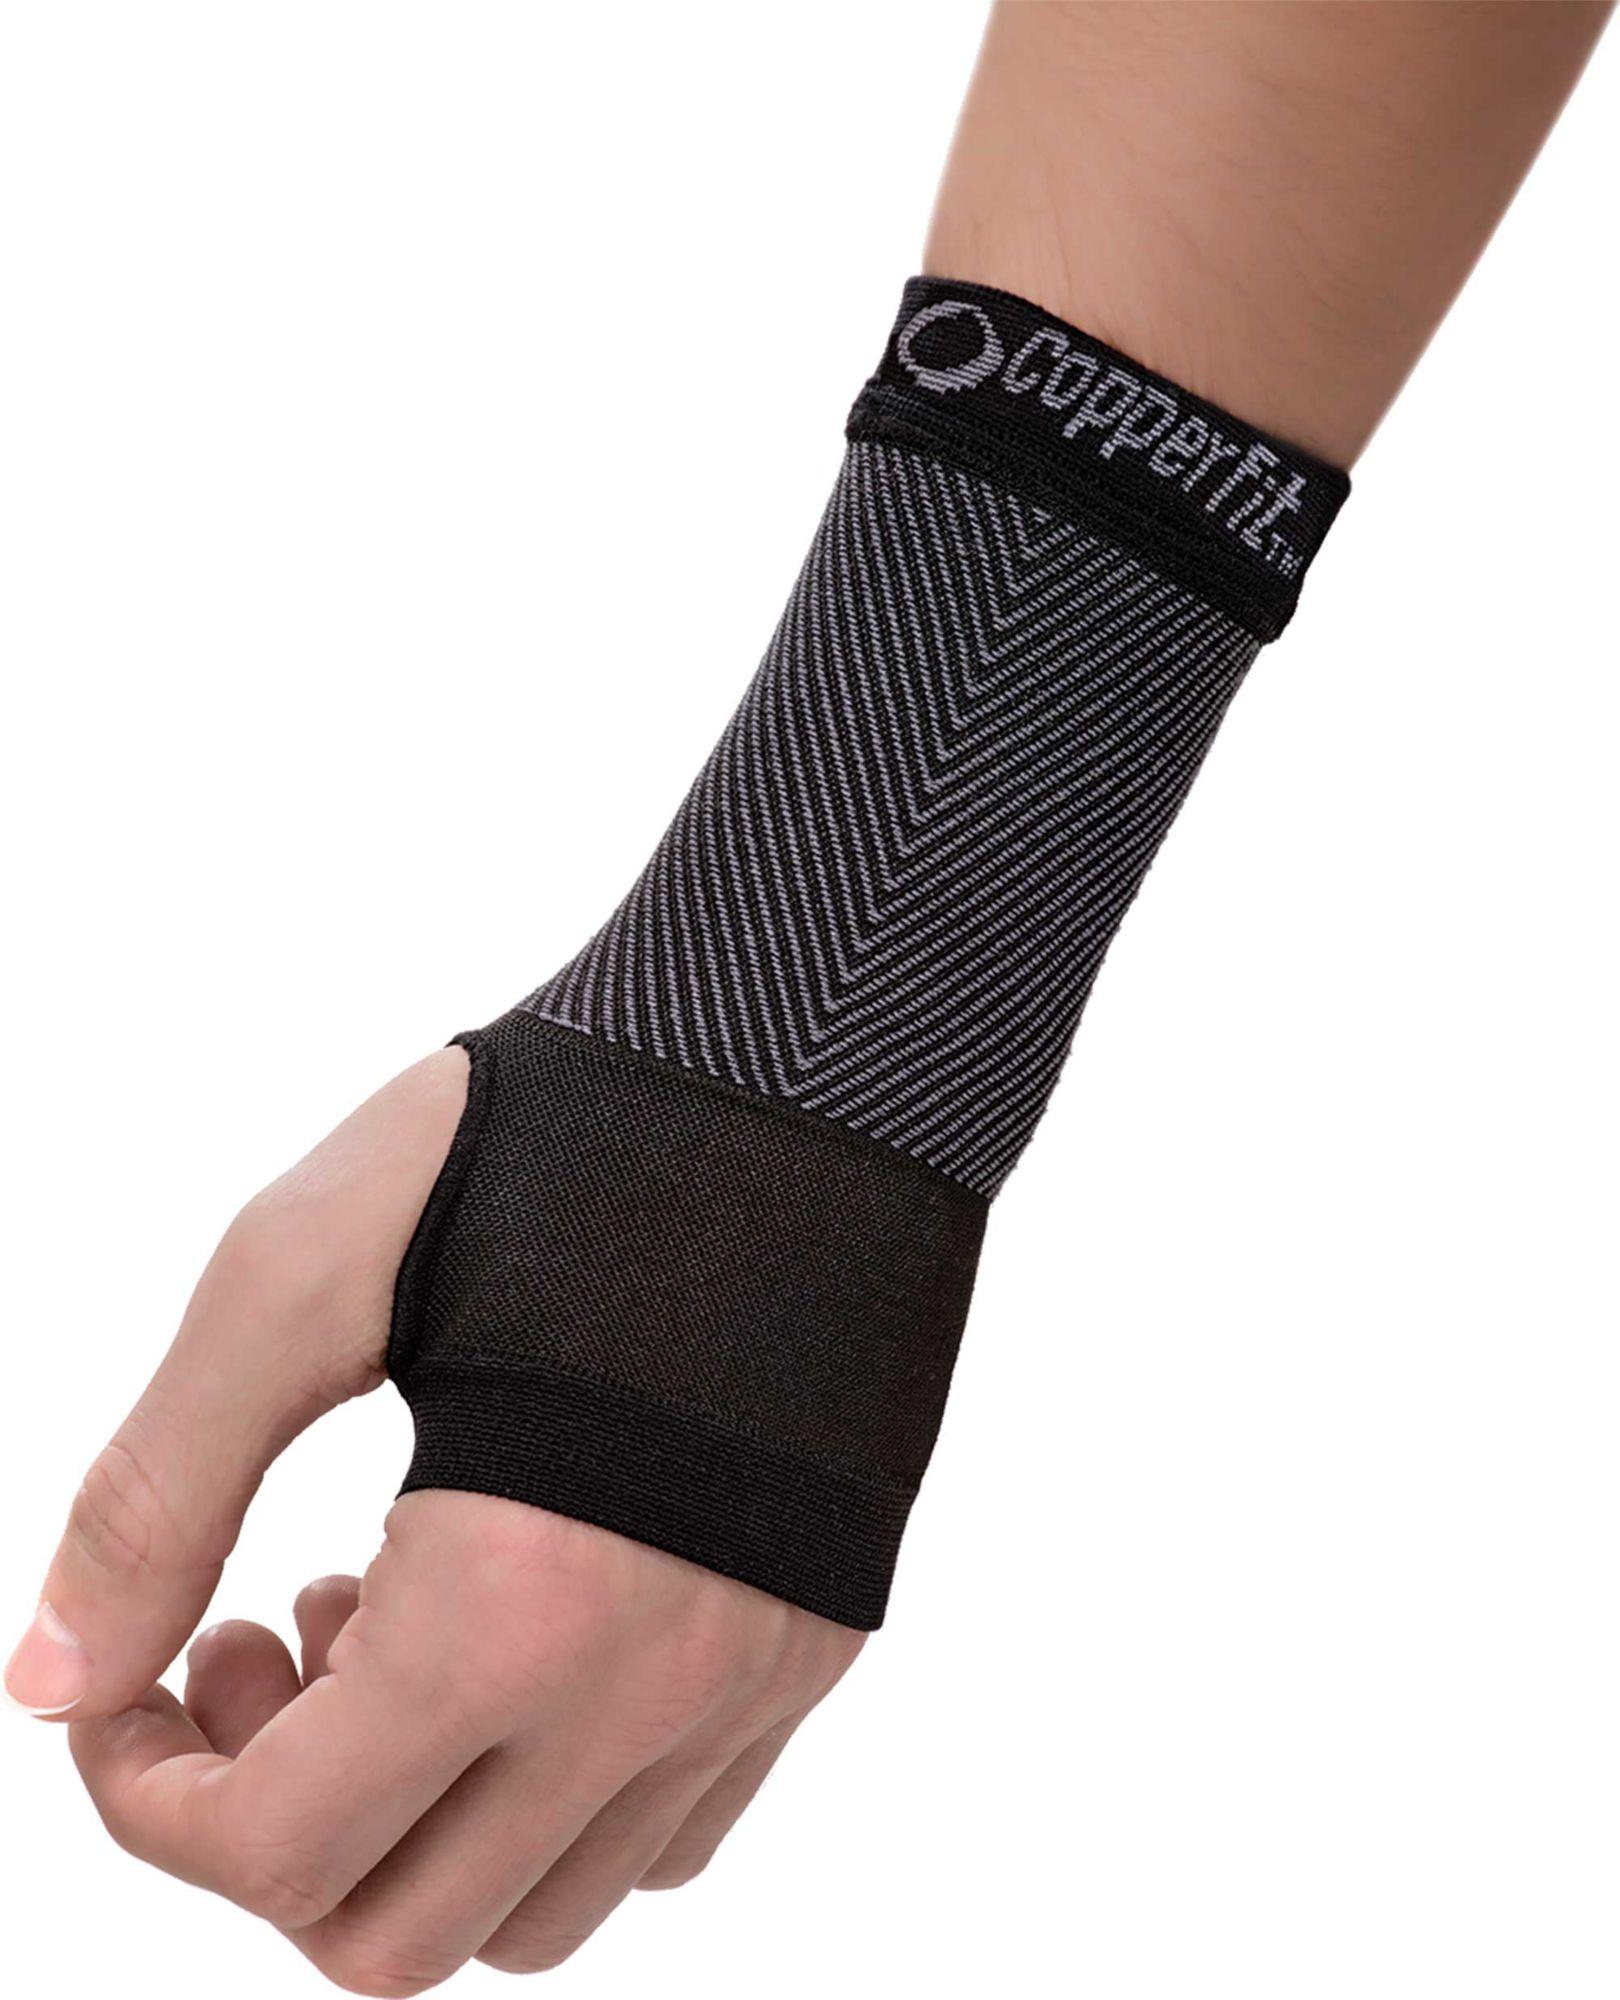 Copper Fit Compression : Copper fit advanced compression wrist sleeve dick s